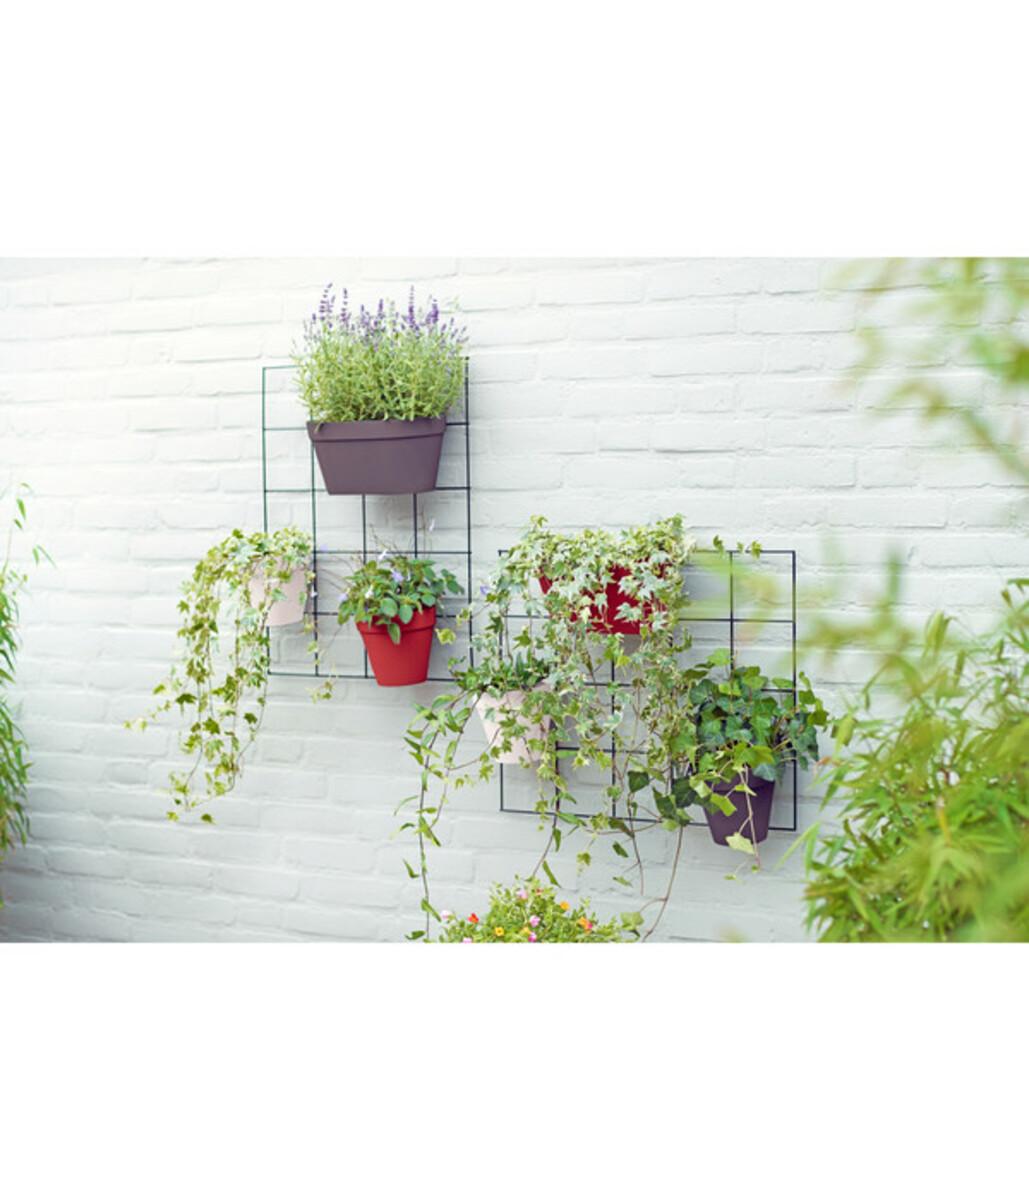 Bild 2 von elho Kunststoff-Wandhängetopf Loft Urban Green Wall Duo, ca. B28/H13,6/T15,1 cm